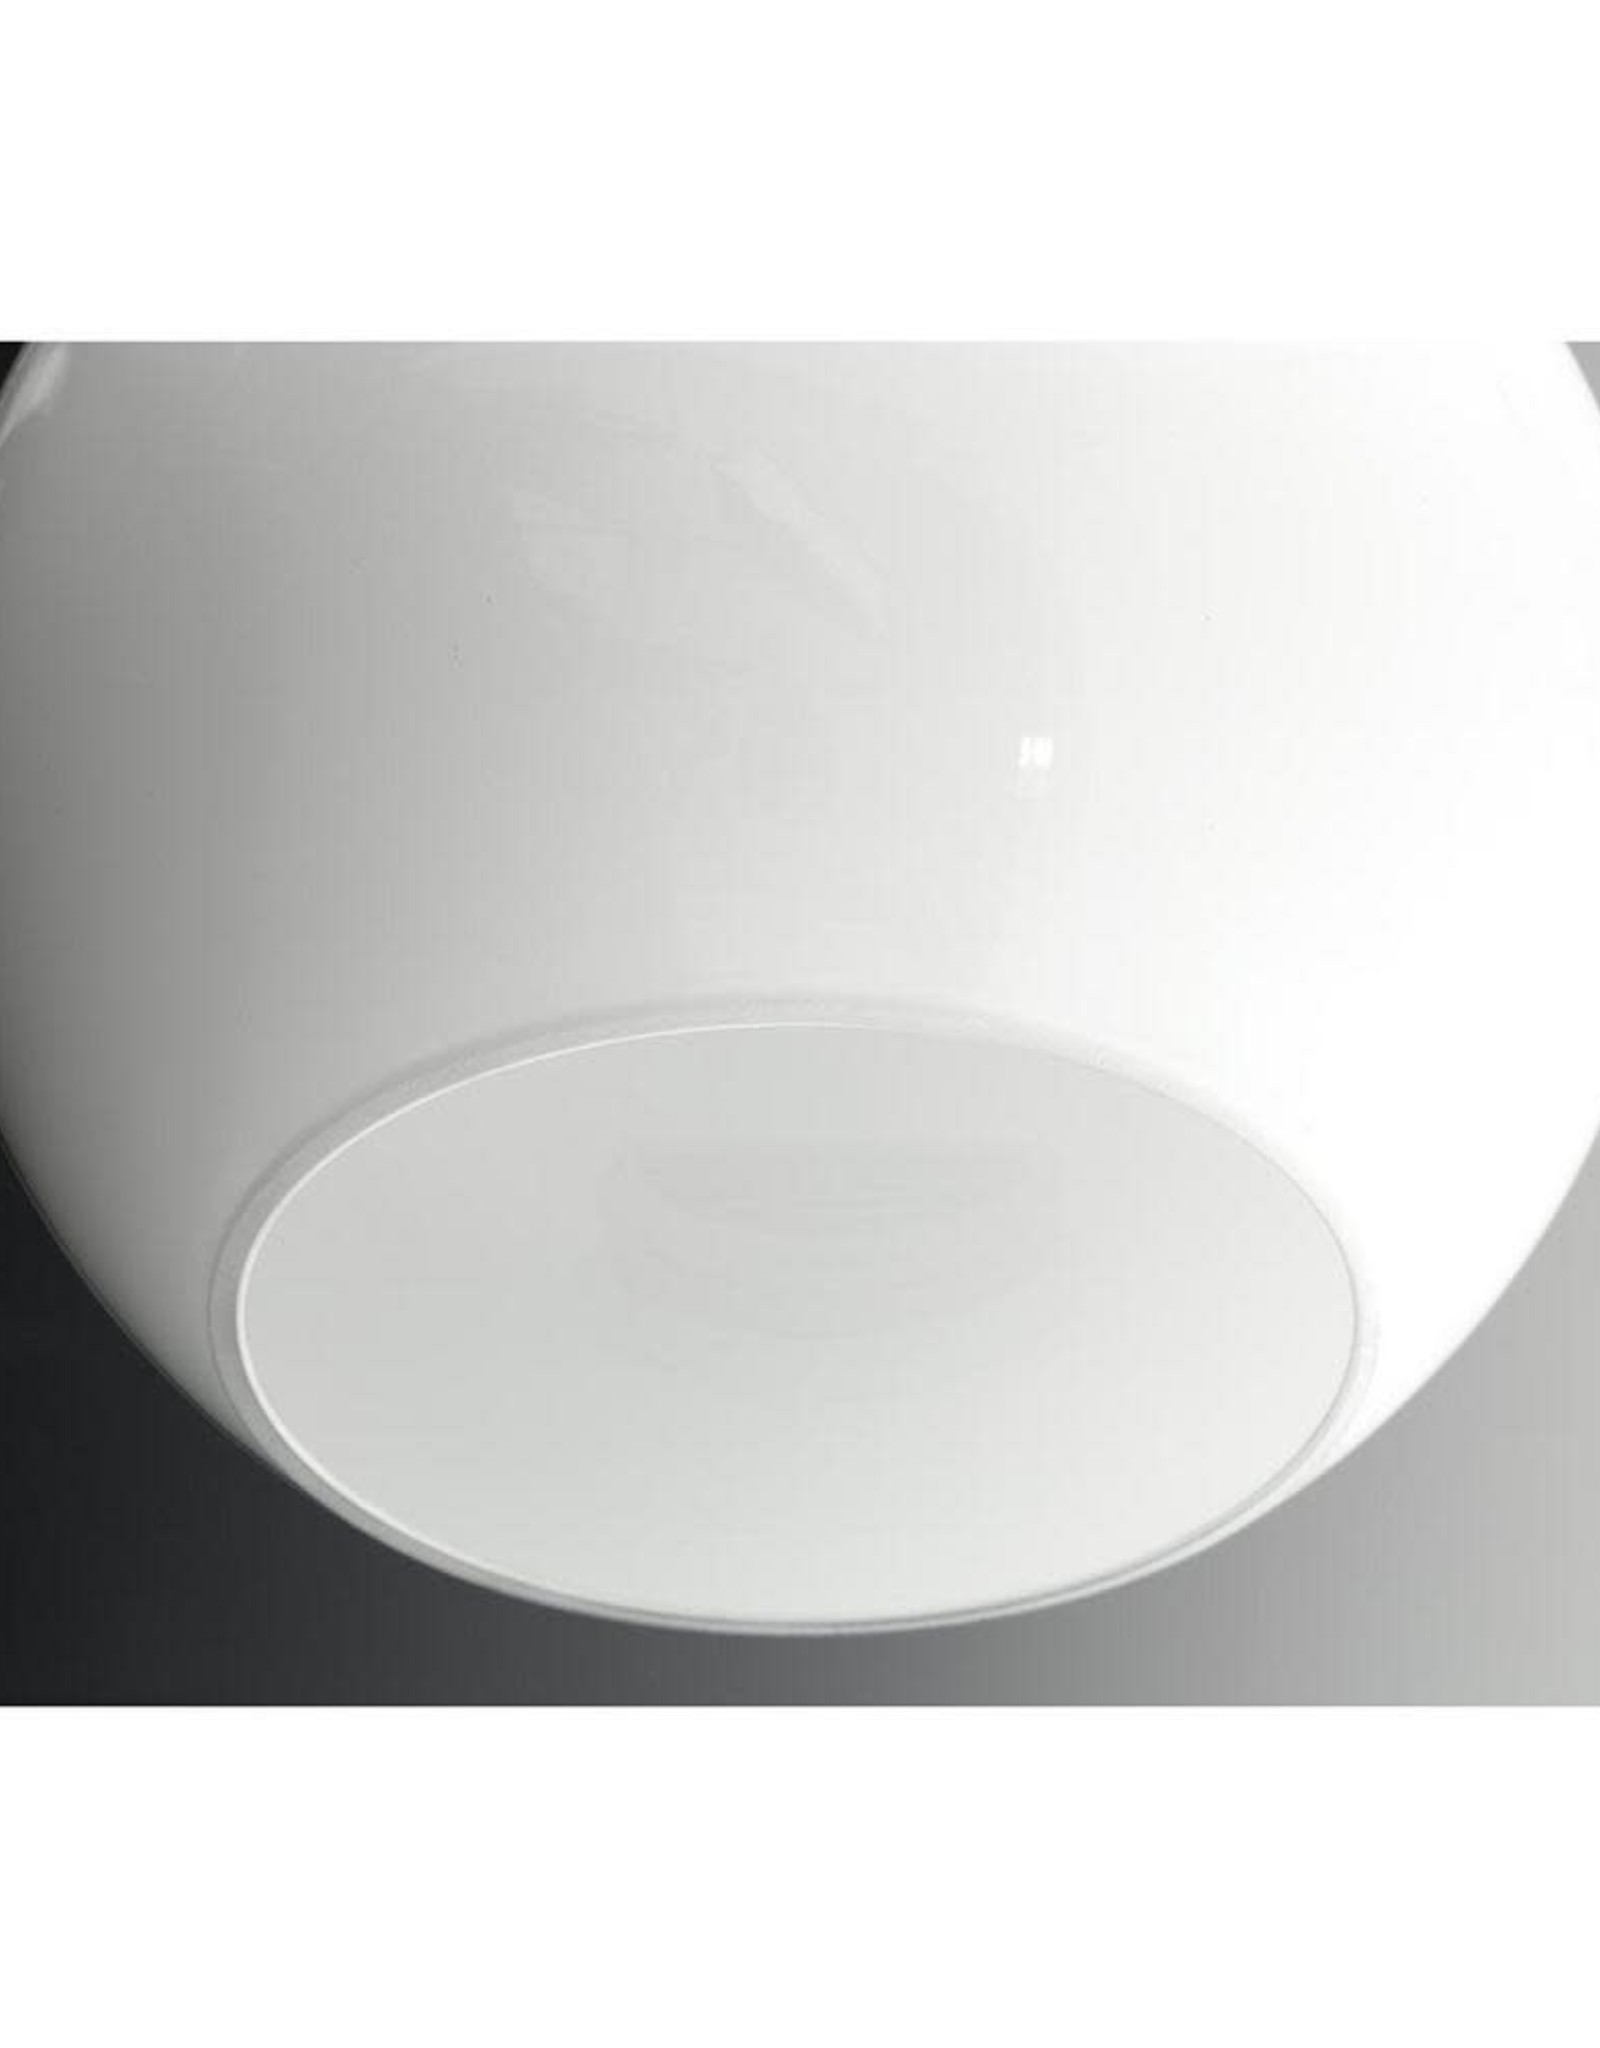 Progress Lighting Carisa Collection 3-Light Brushed Nickel Bath Light